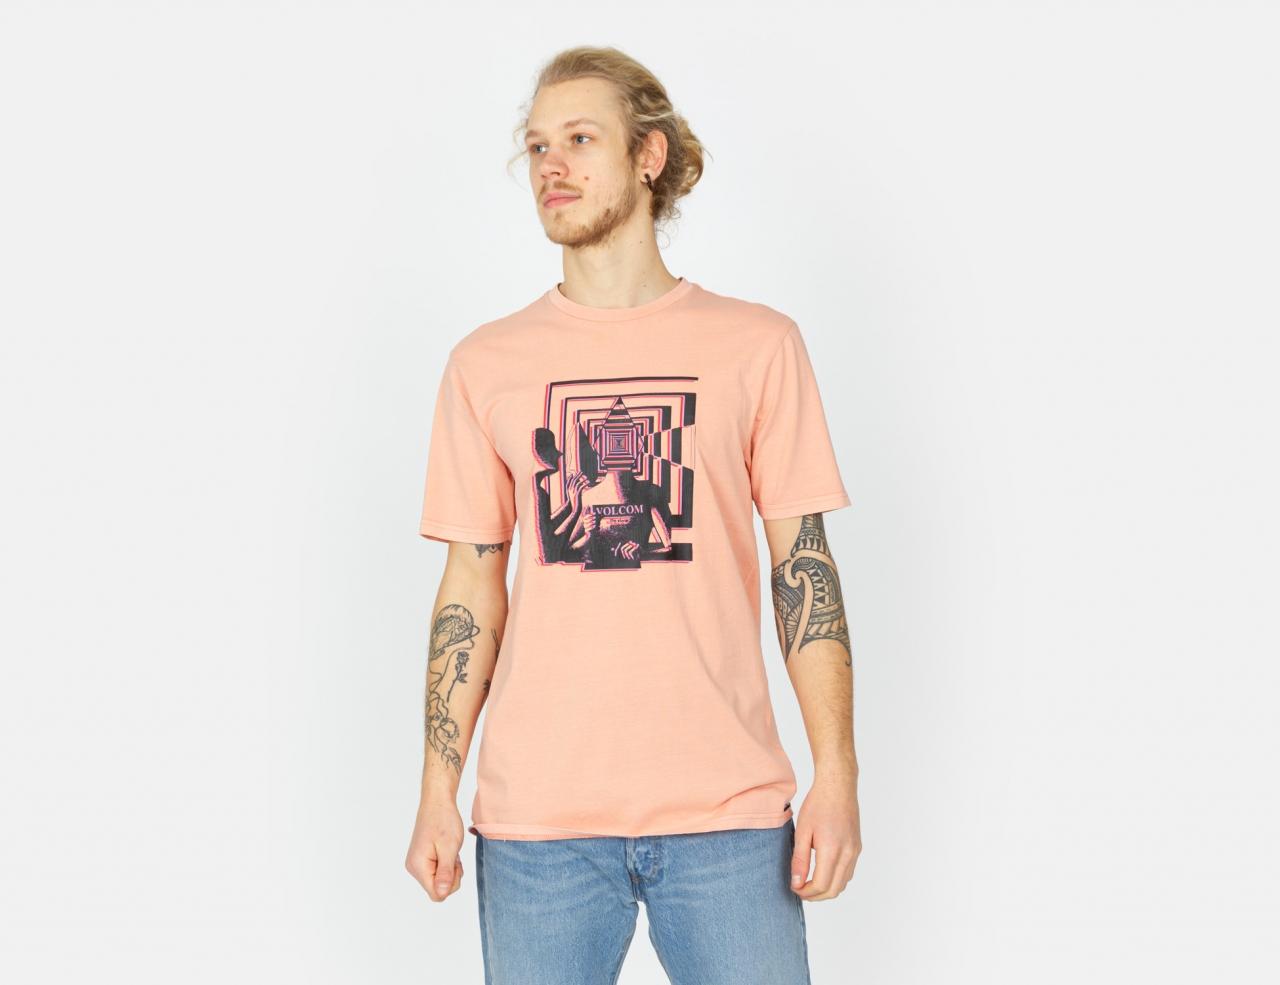 Volcom Stone Reveal T-Shirt - Clay Orange